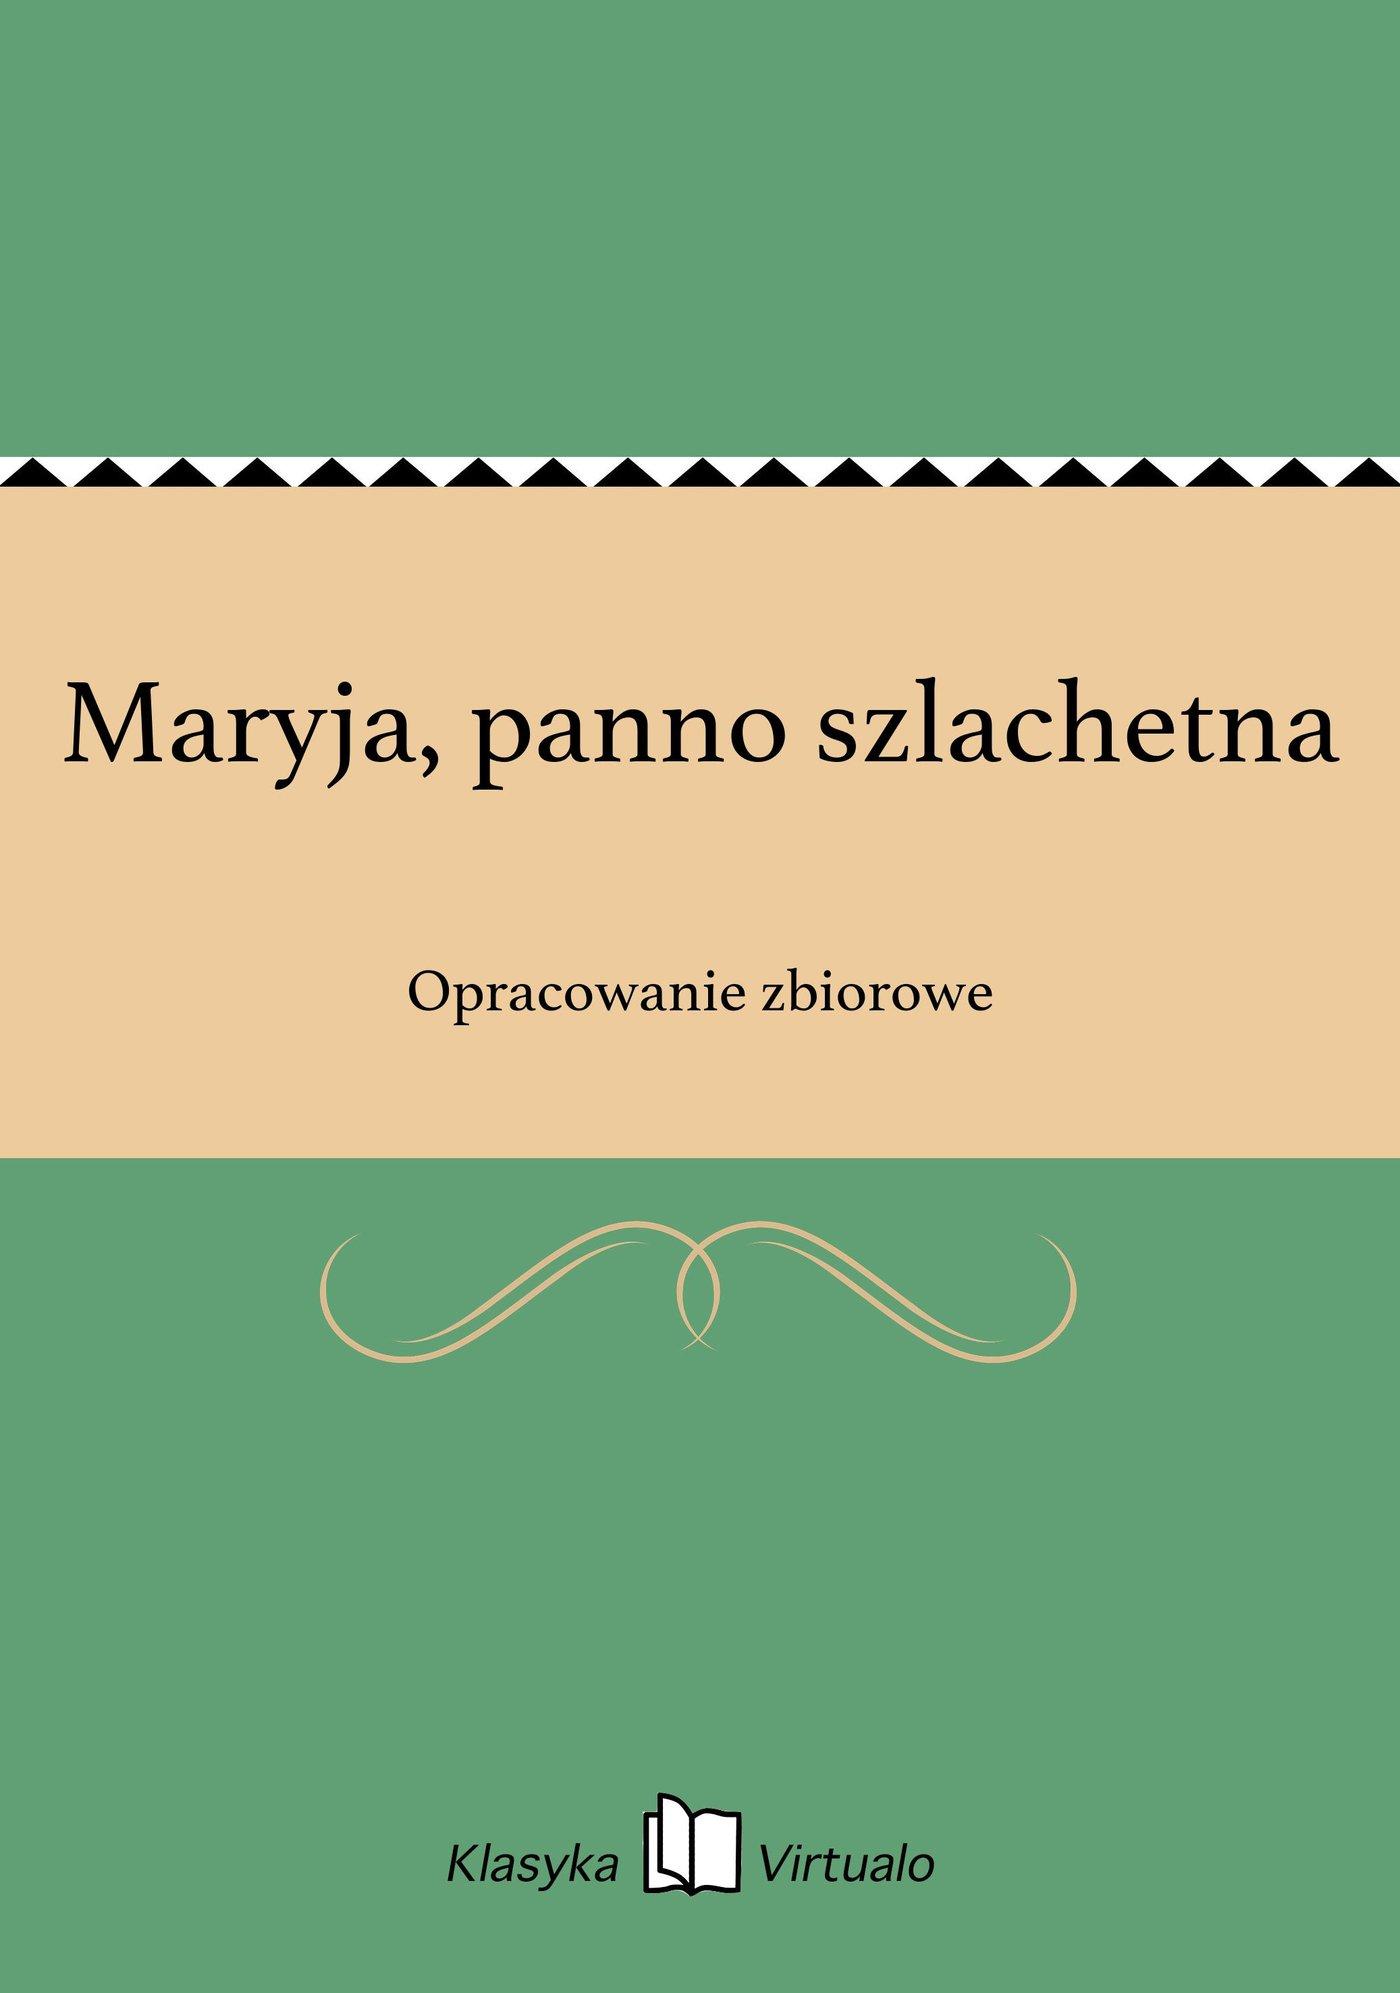 Maryja, panno szlachetna - Ebook (Książka na Kindle) do pobrania w formacie MOBI